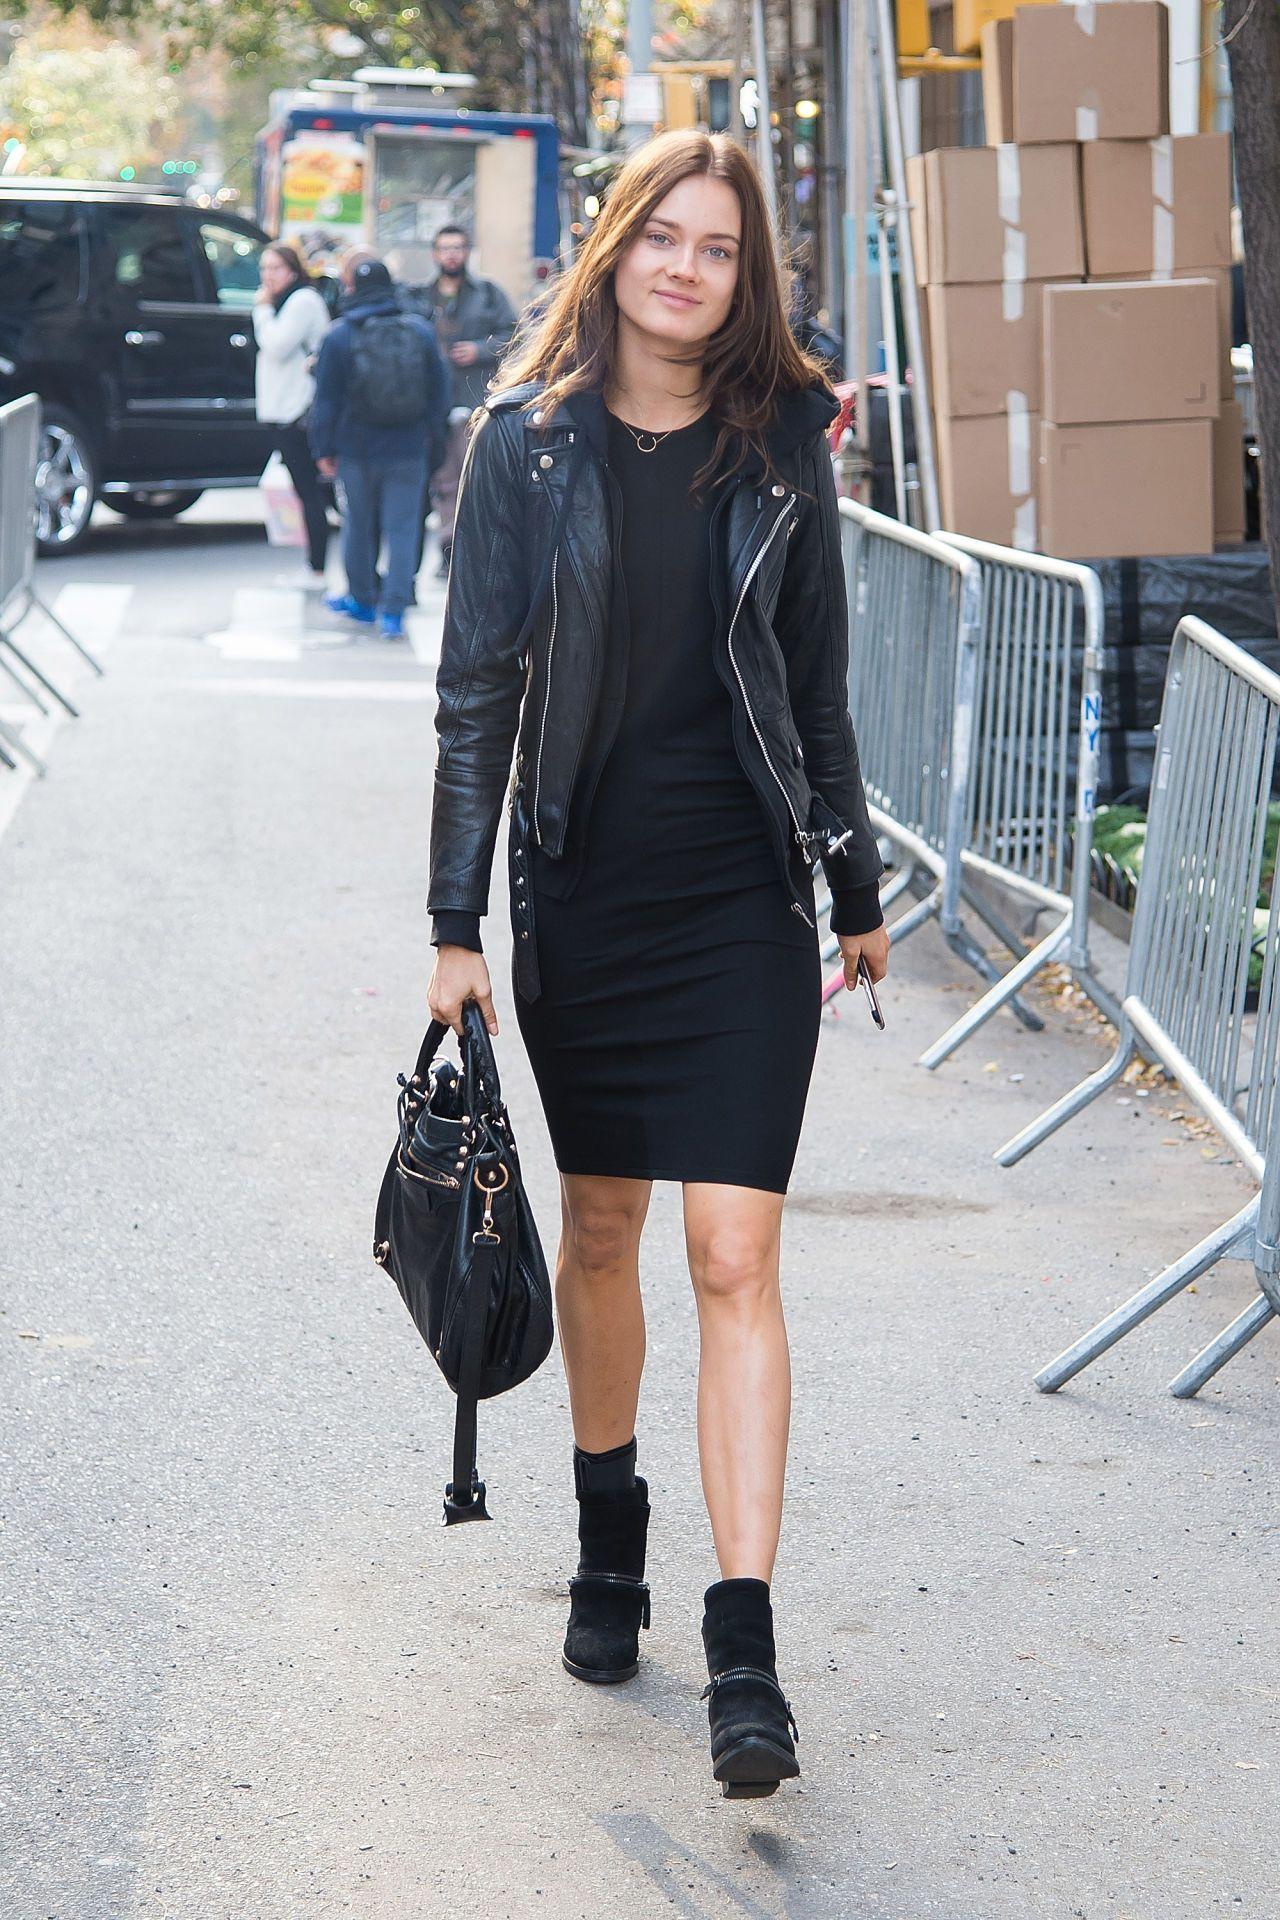 Kendall Jenner Victoria's Secret Fashion - Victoria's Secret Model Street Style